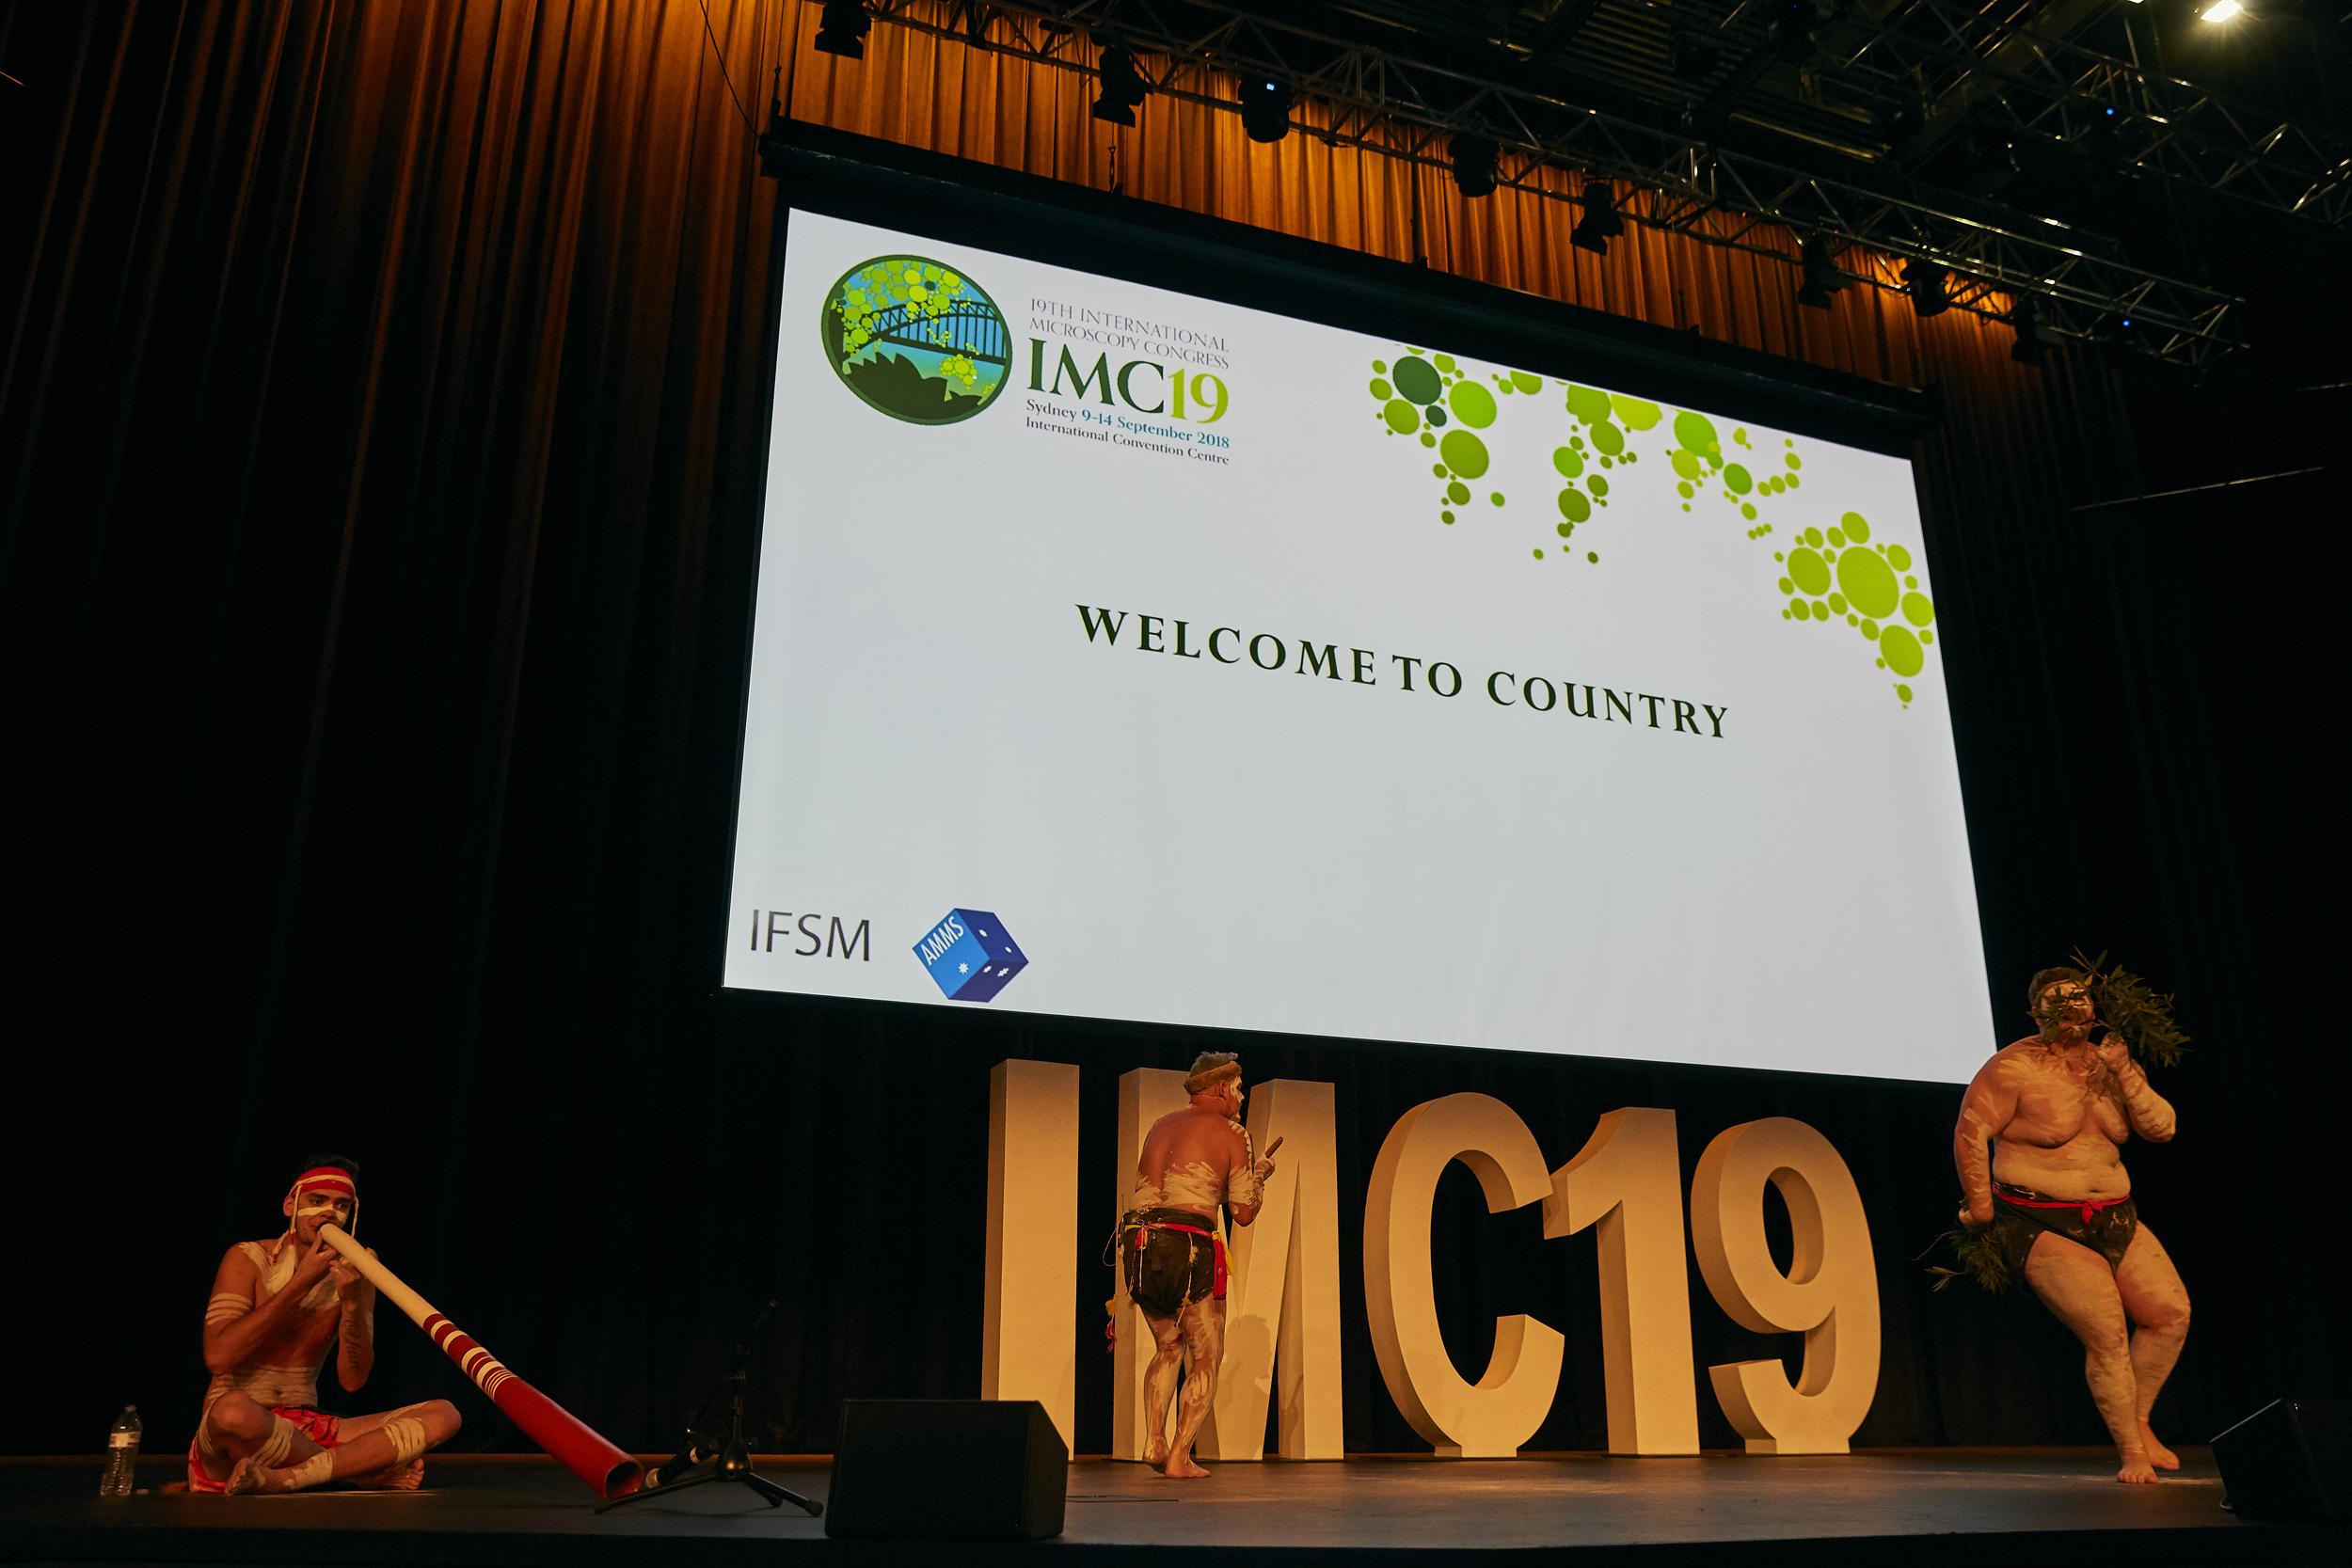 10.9.18_IMC19 ICC_ 74.jpg